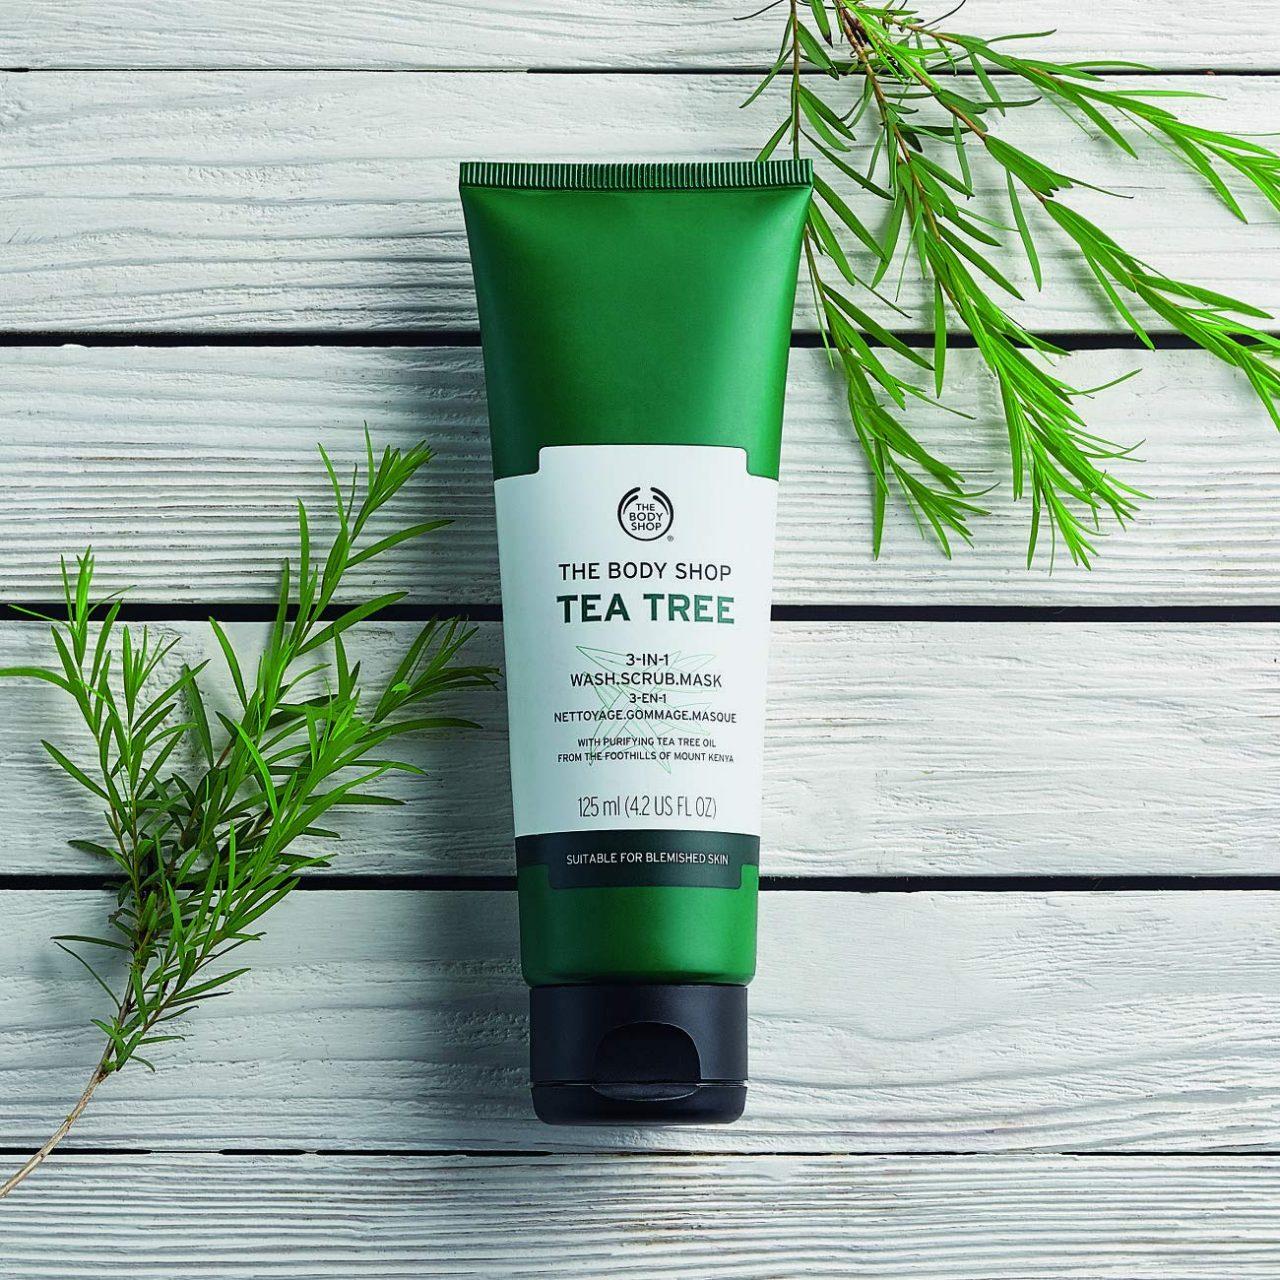 The Body Shop Tea Tree 3 In 1 Wash Scrub Mask Face Wash